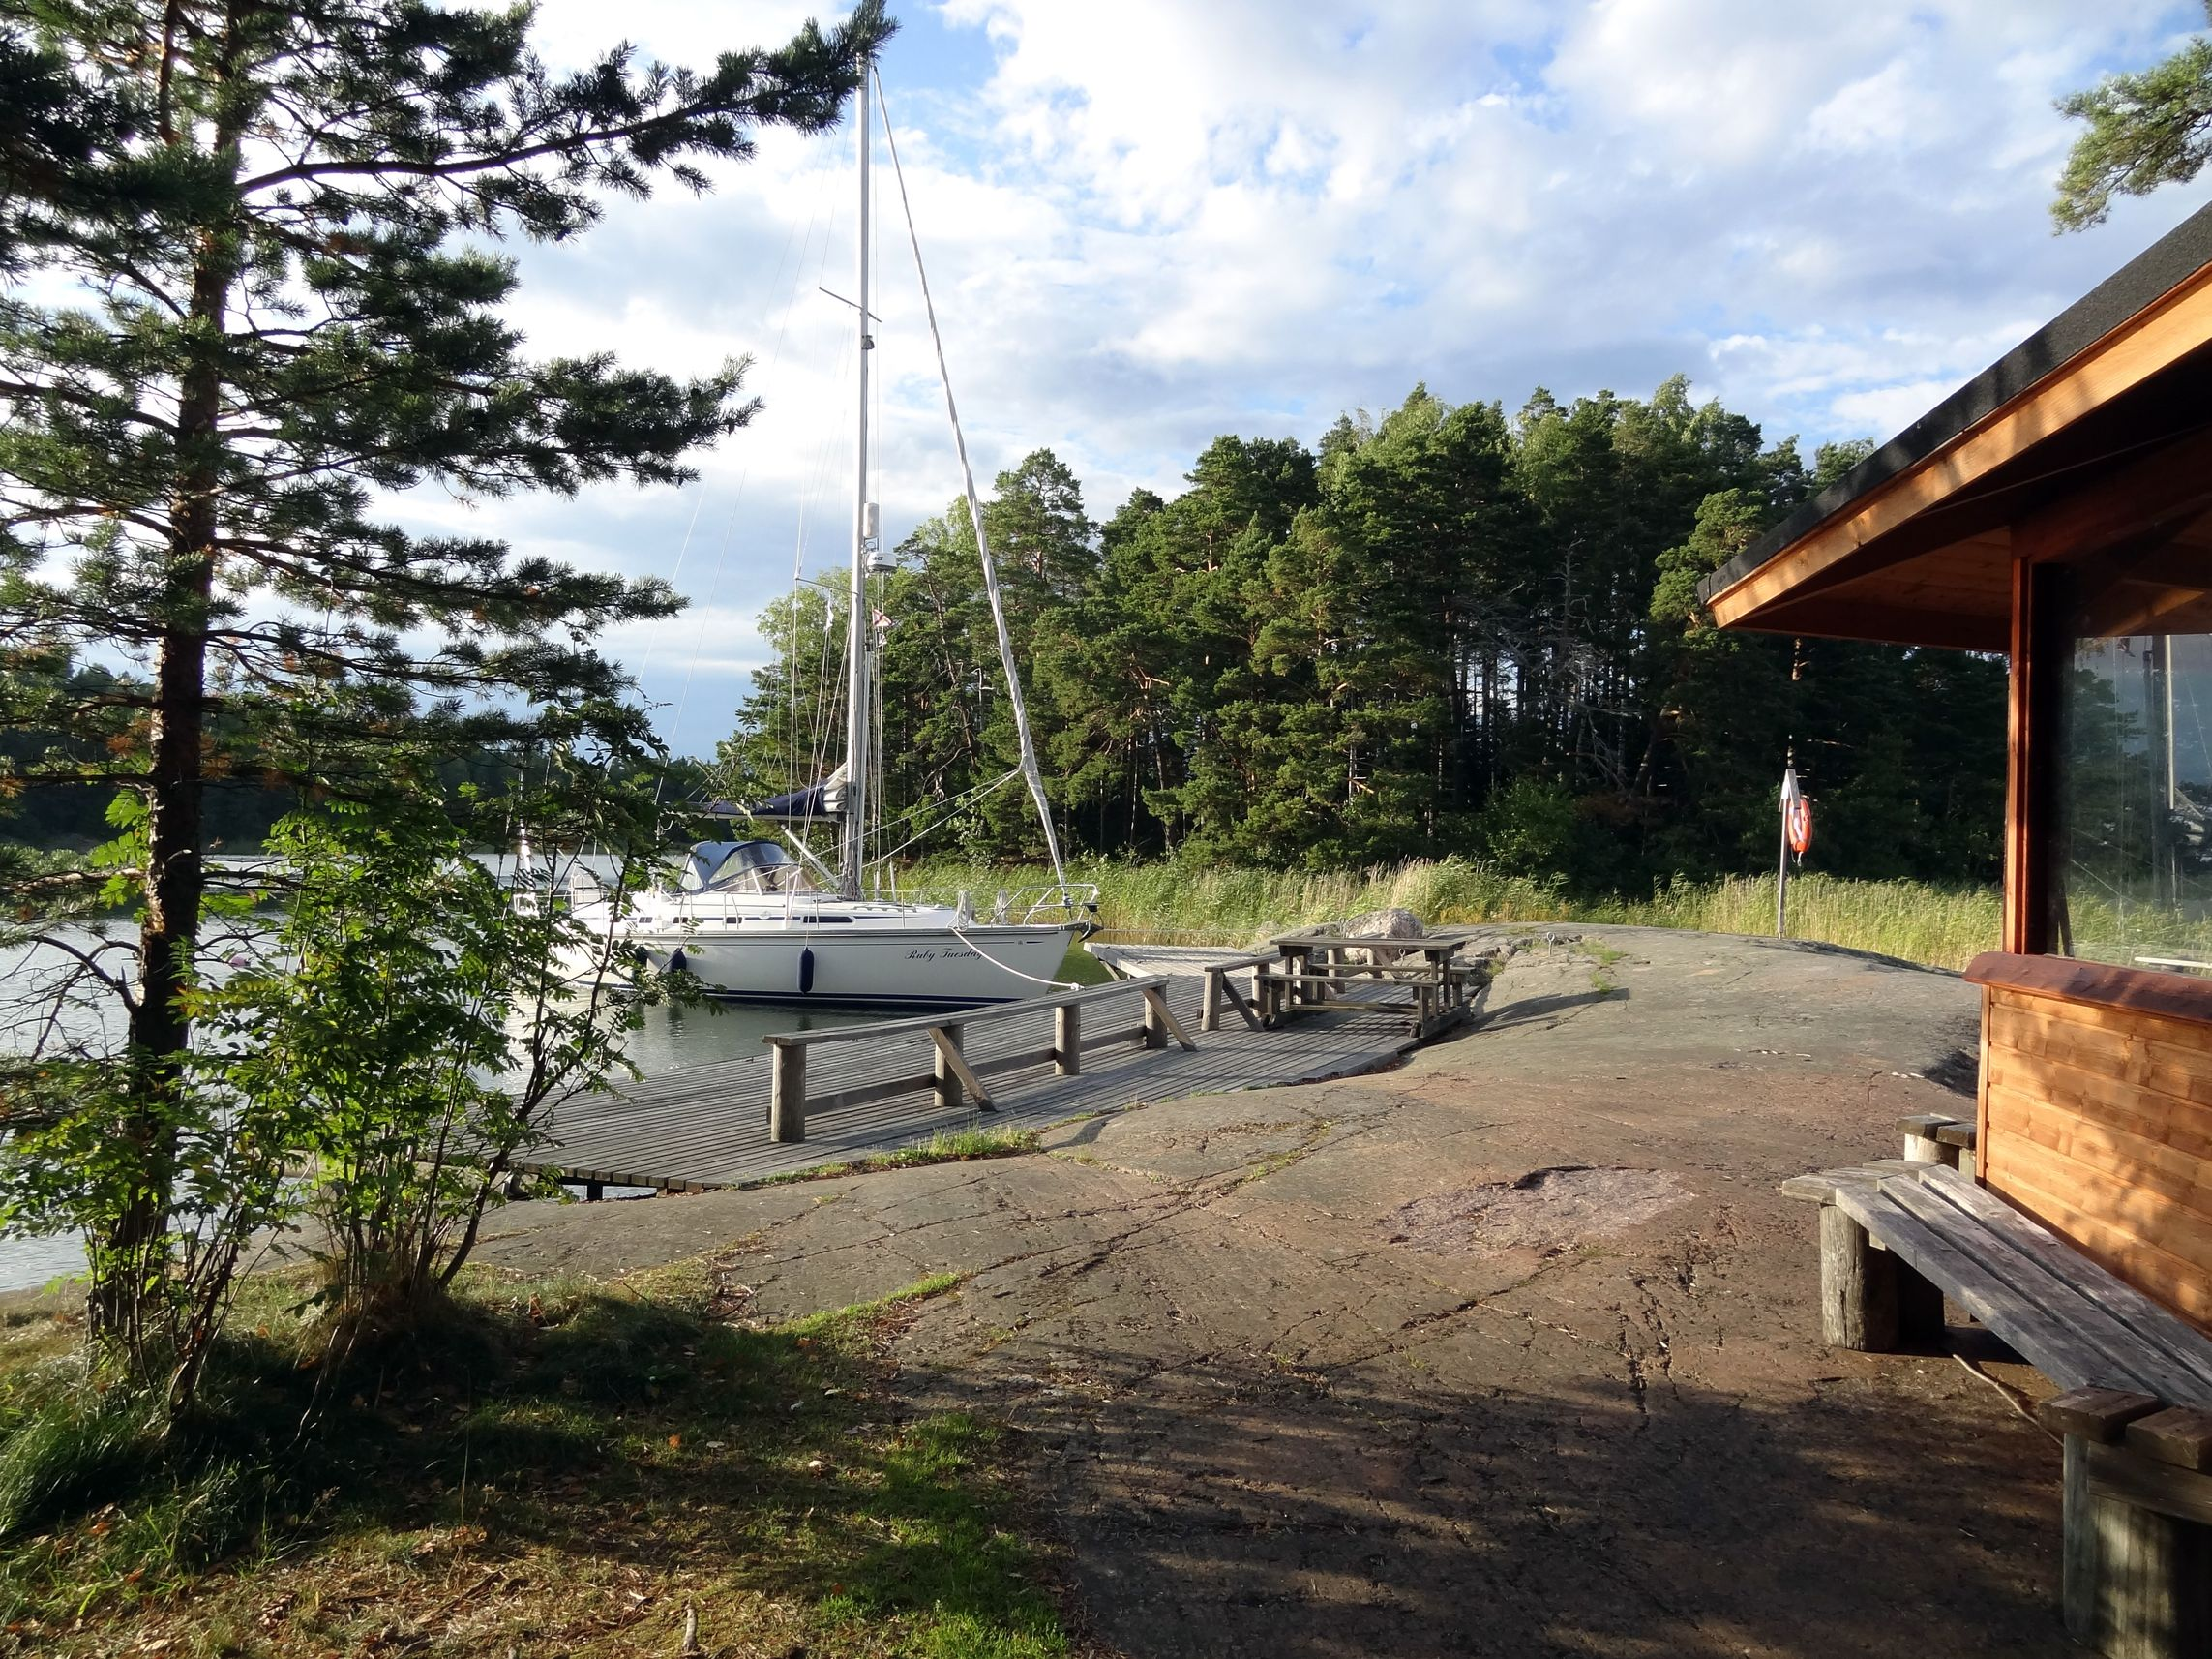 Anlegesteg auf Linlö